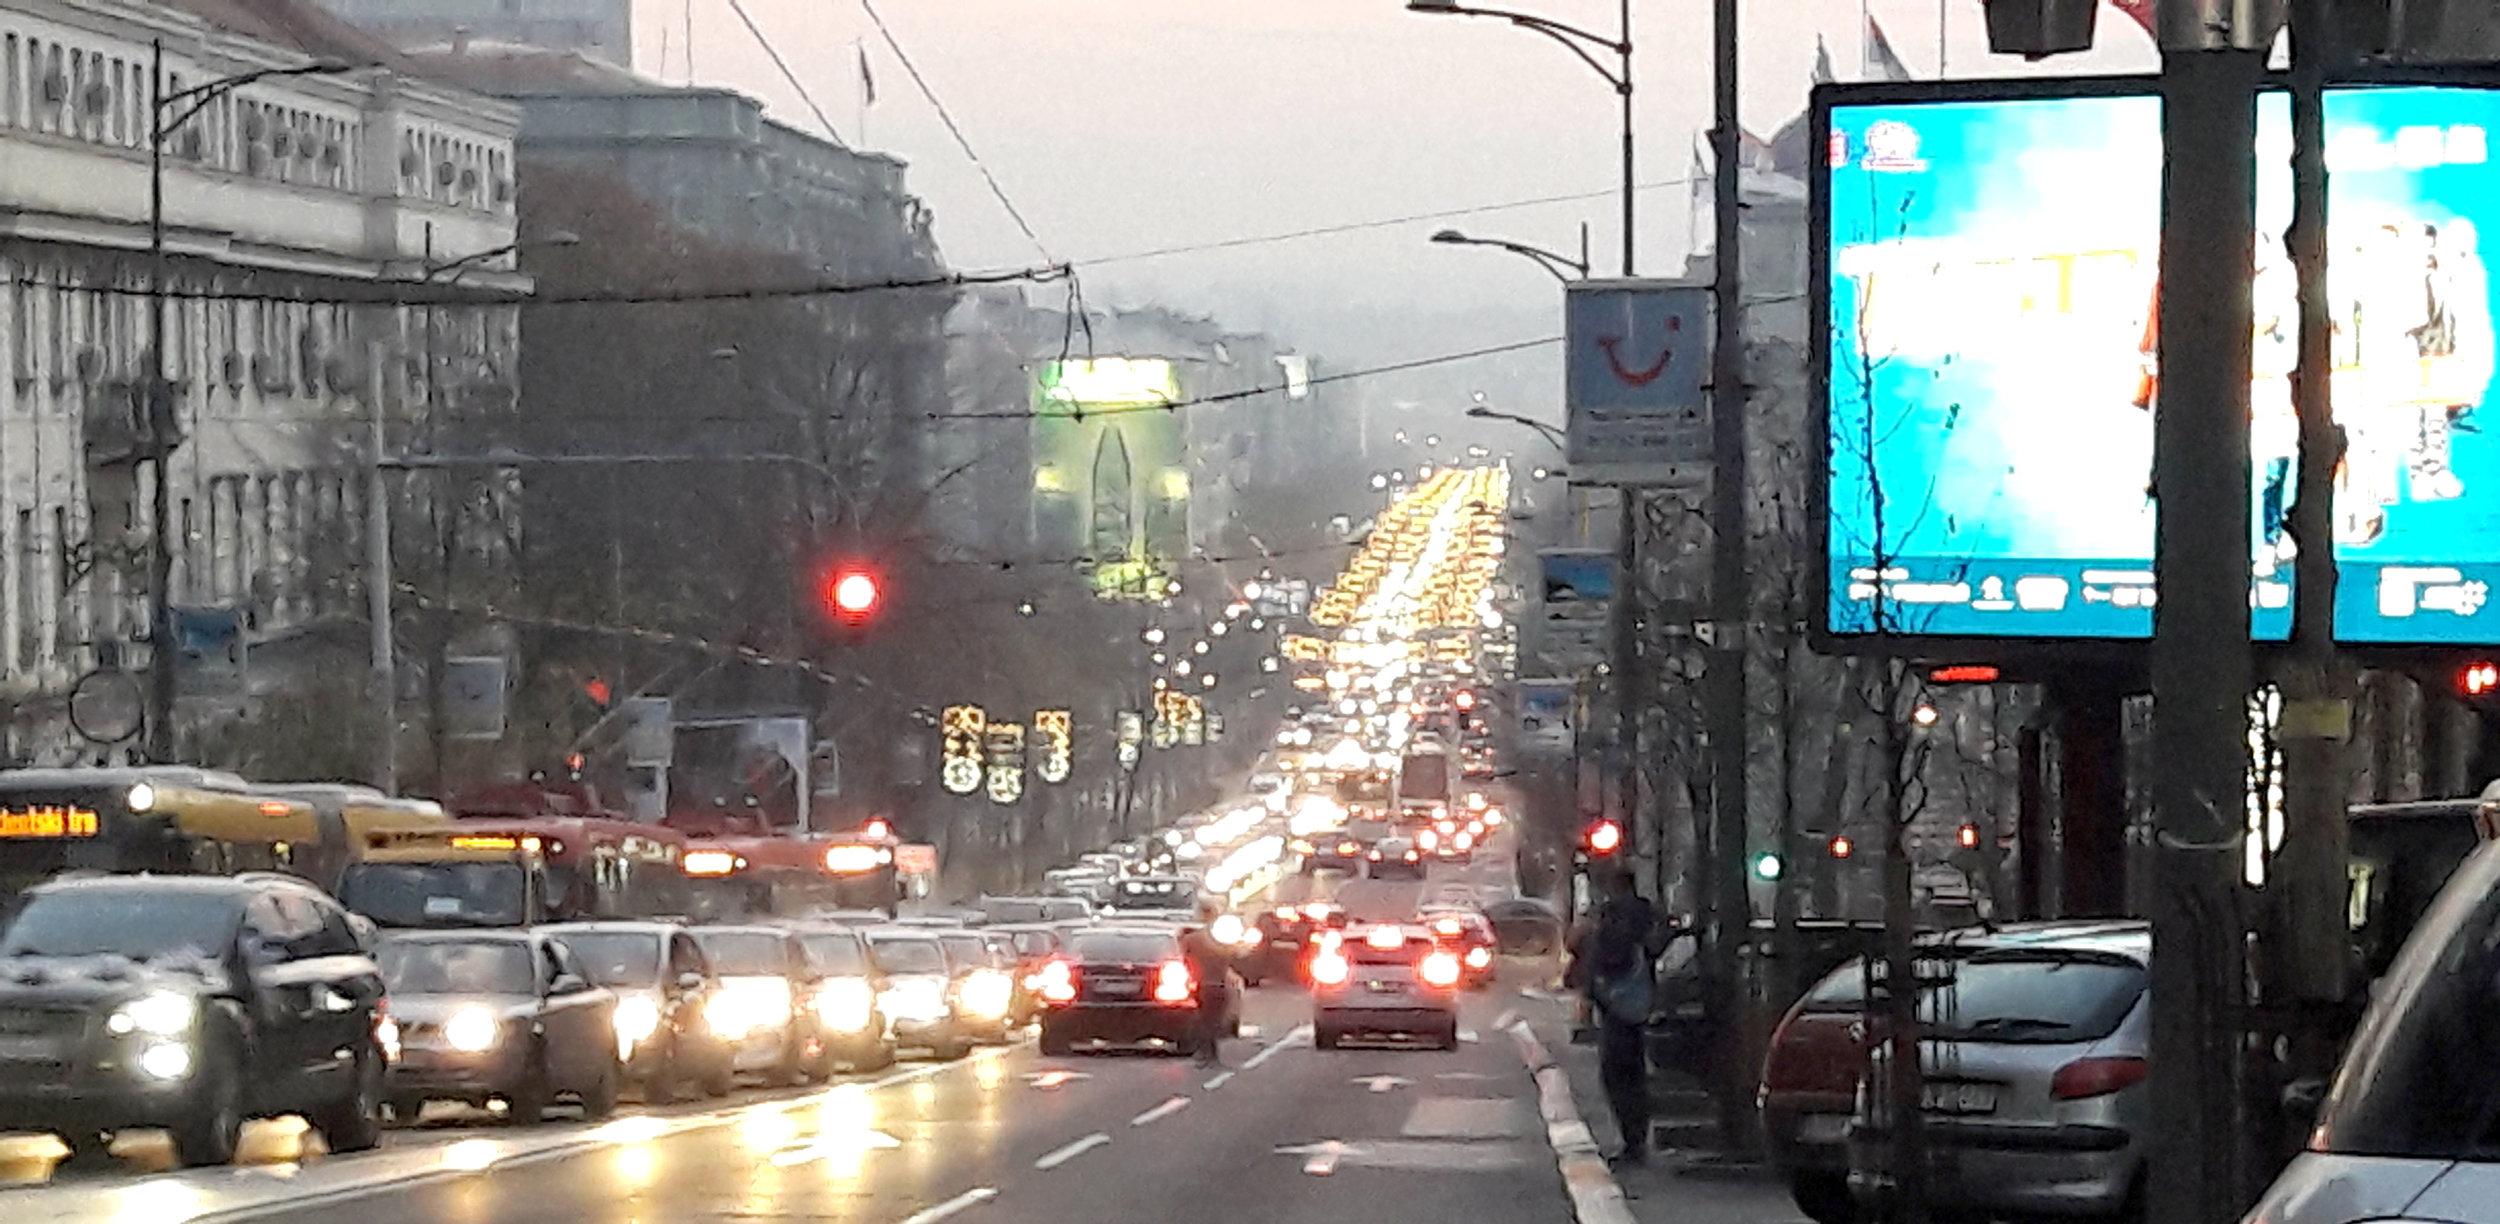 Ulica Kneza Miloša (Prince Miloš [pronounced 'Mee-losh']Street)